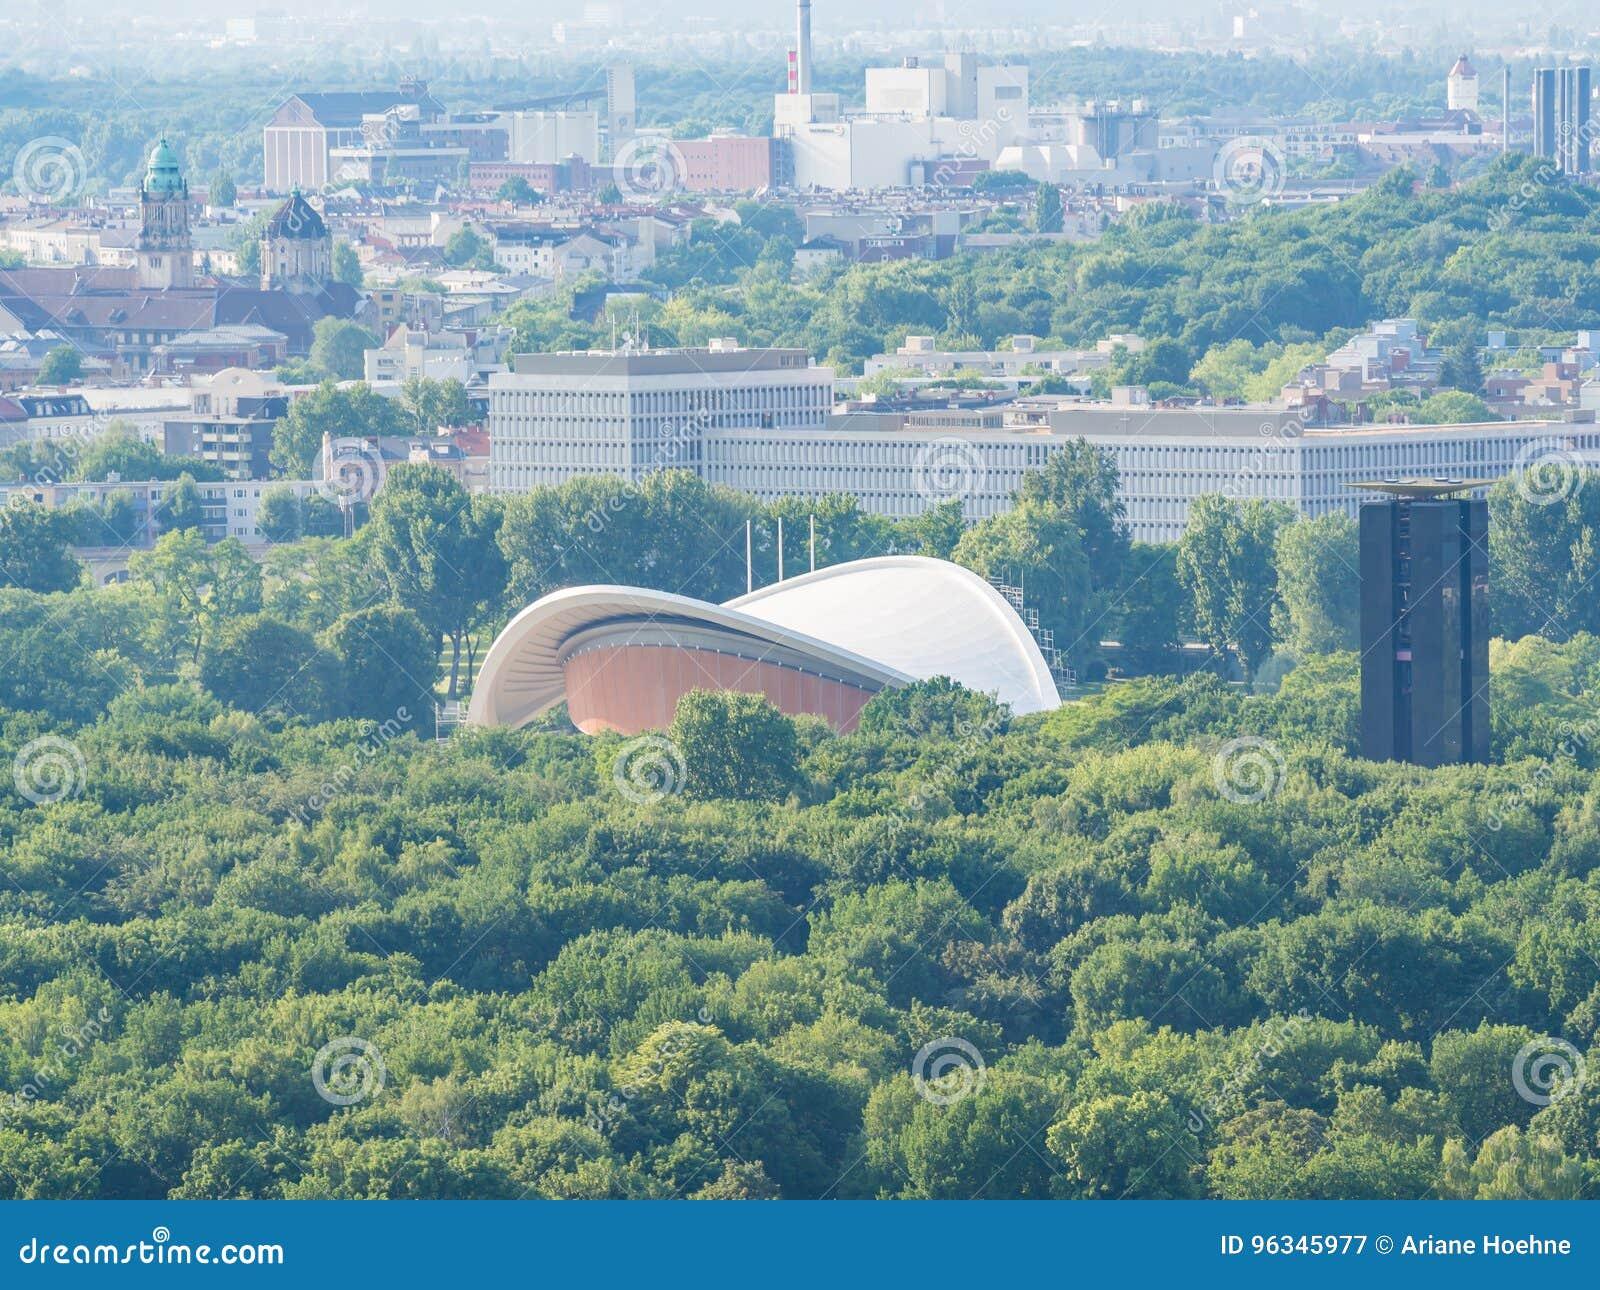 Widok z lotu ptaka Haus dera Kulturen dera obrzęk